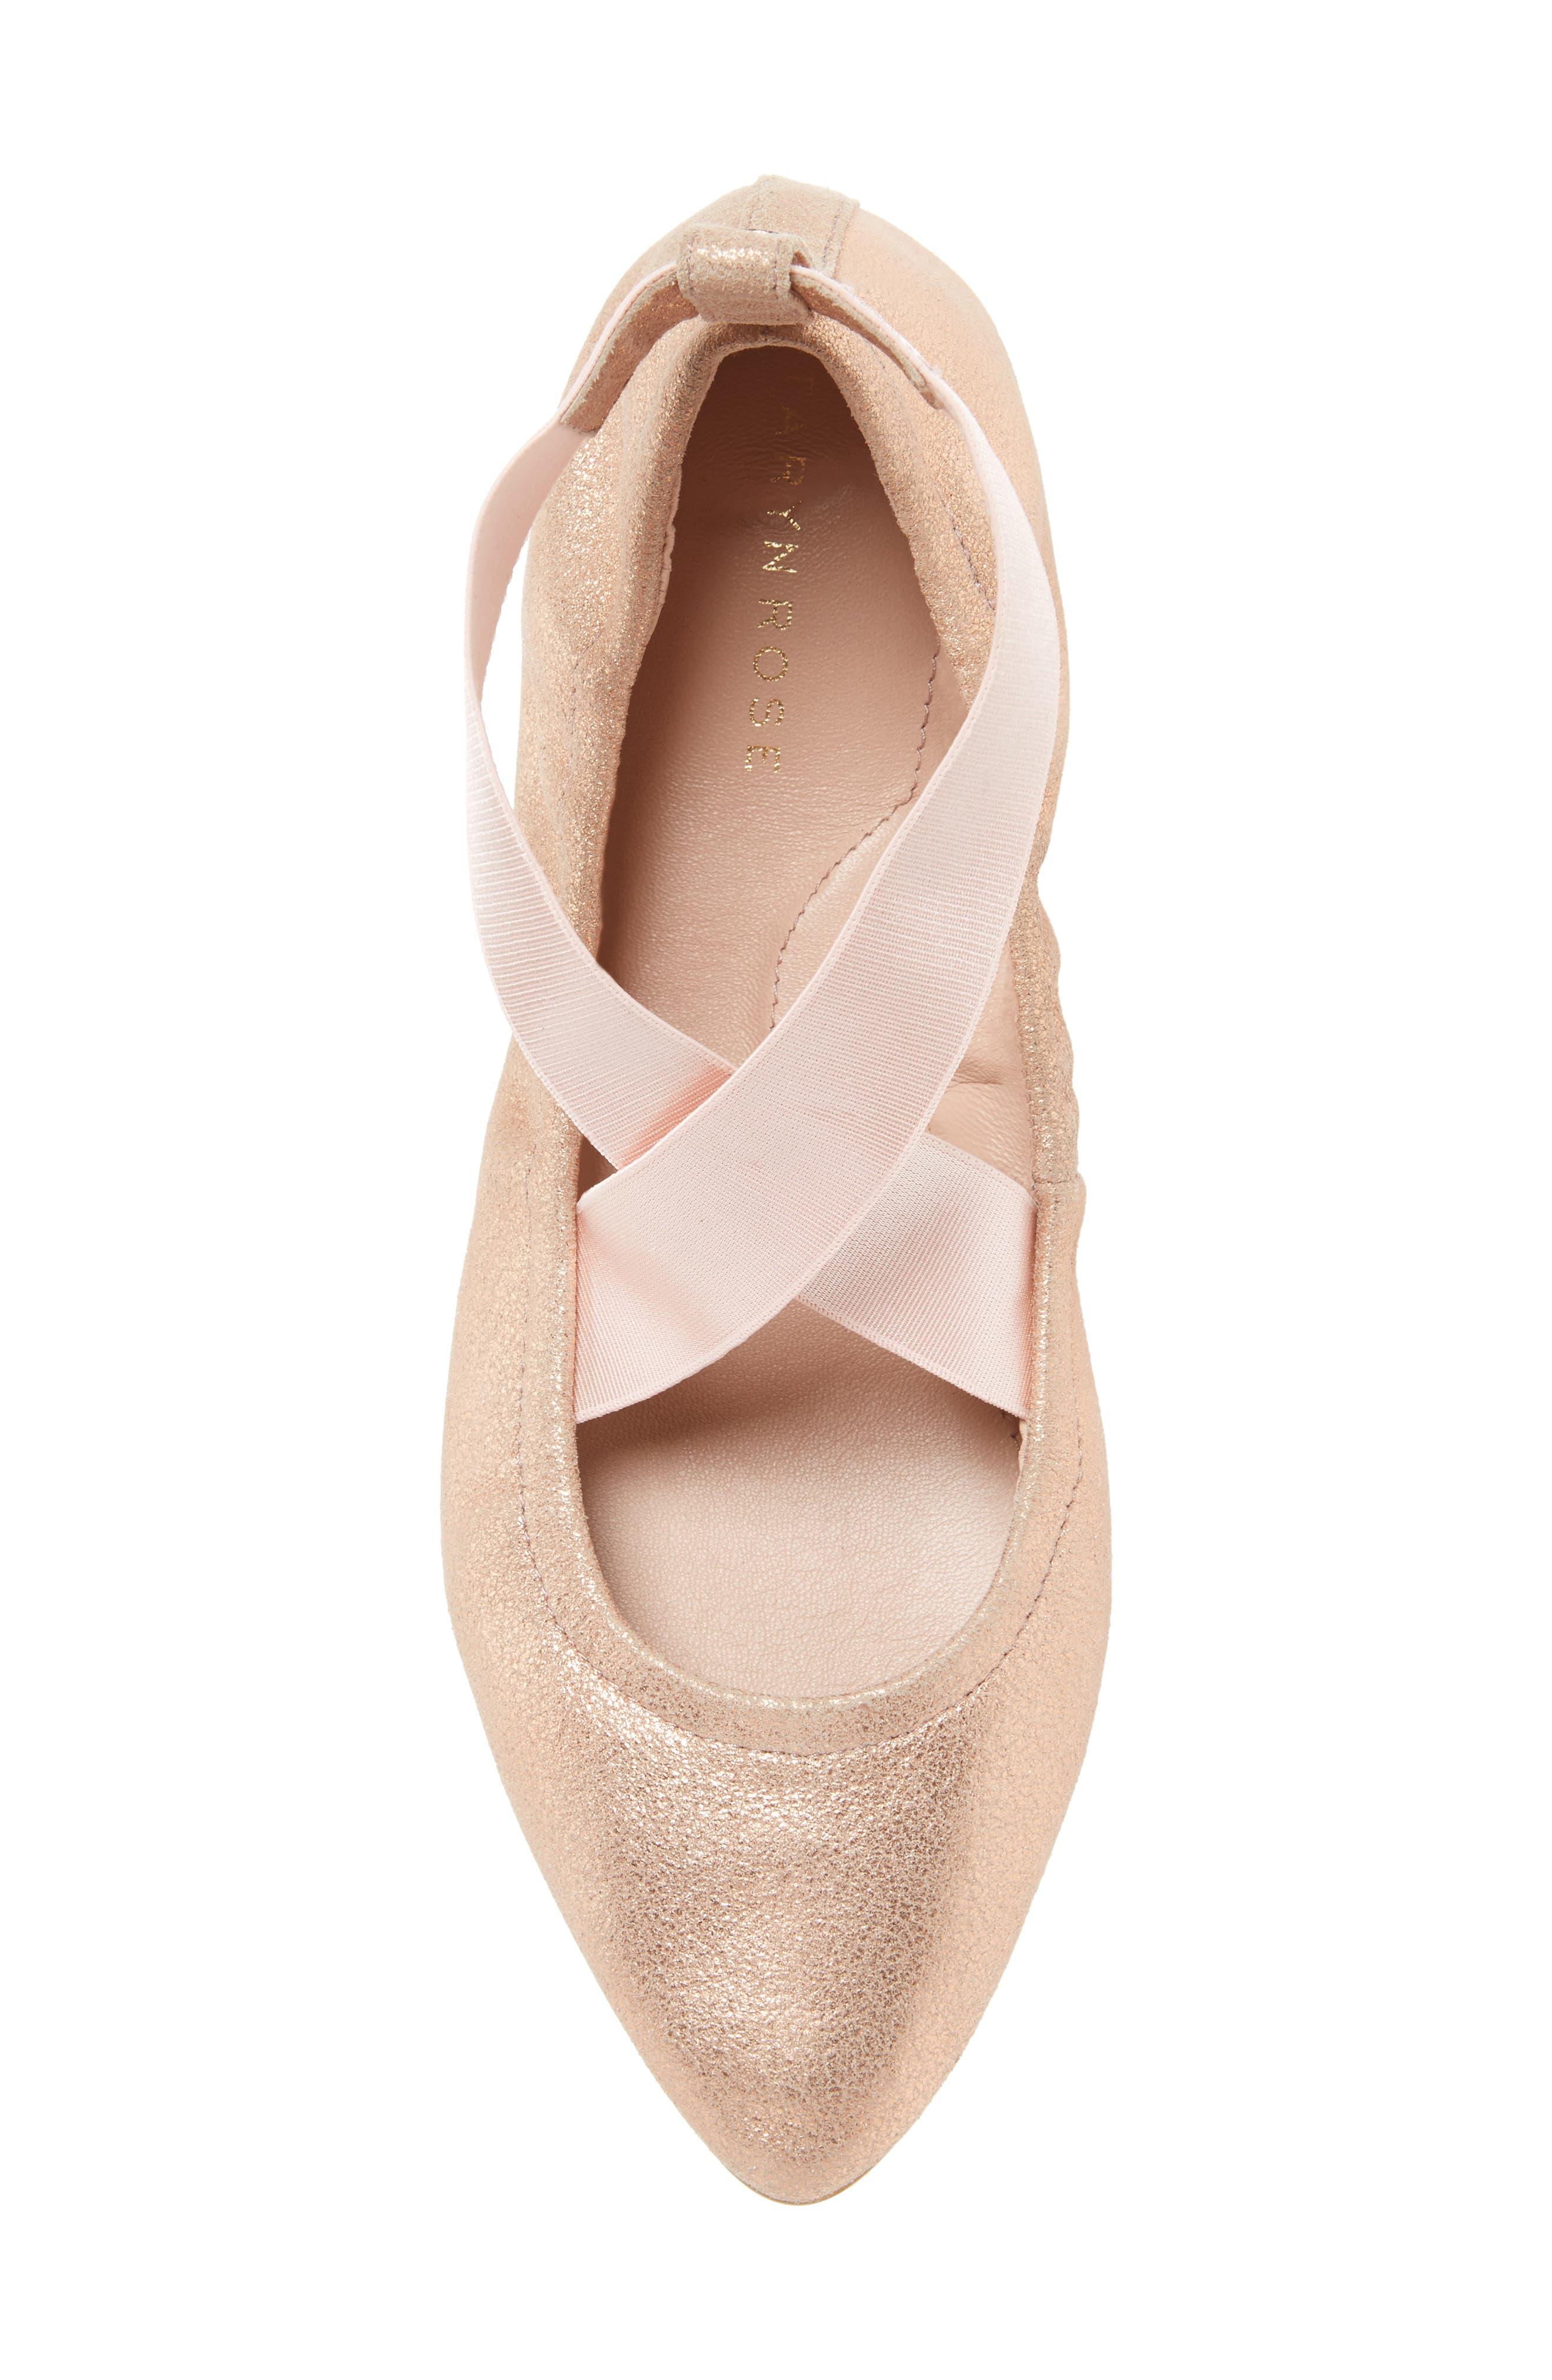 Edina Strappy Ballet Flat,                             Alternate thumbnail 24, color,